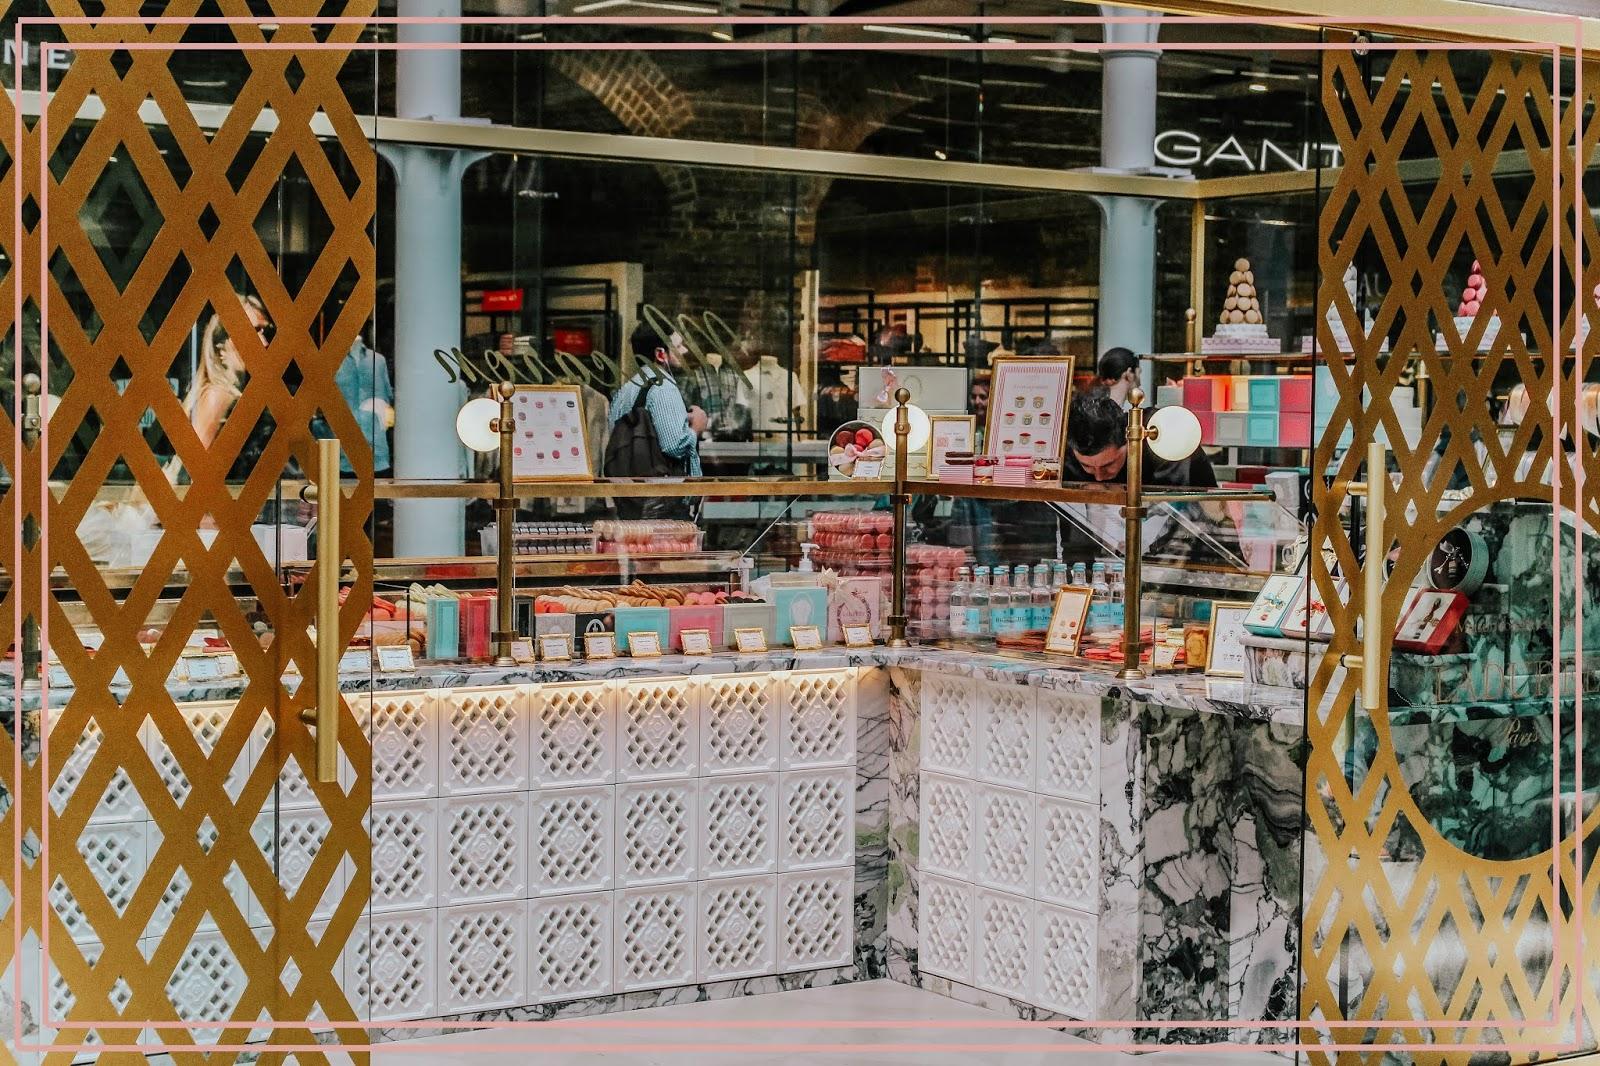 St Pancras Station Laduree Macaron Shop